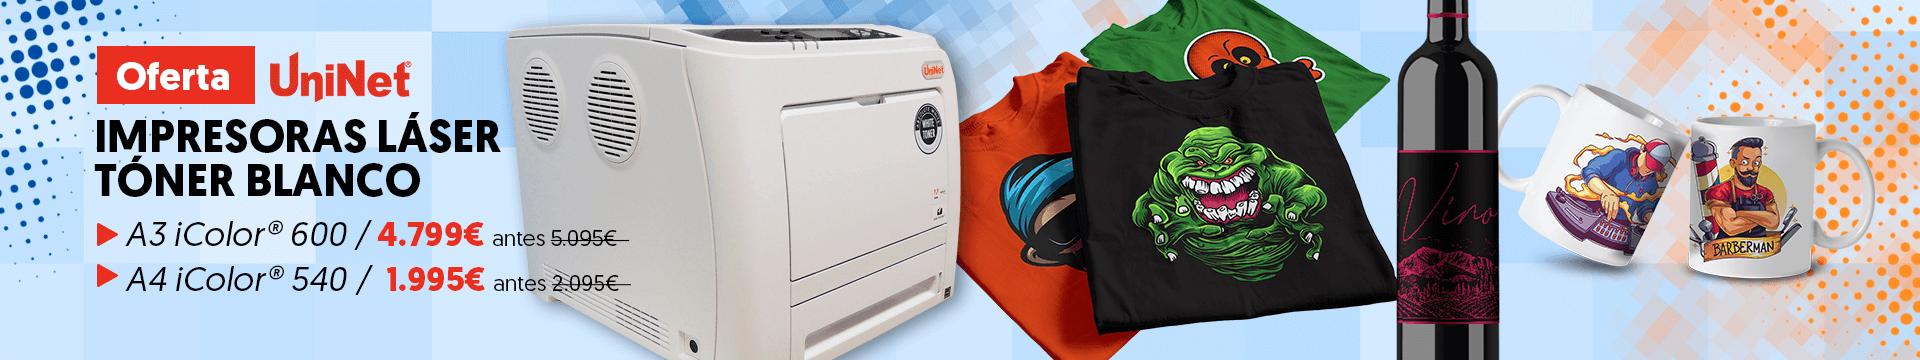 Oferta Impresoras Uninet